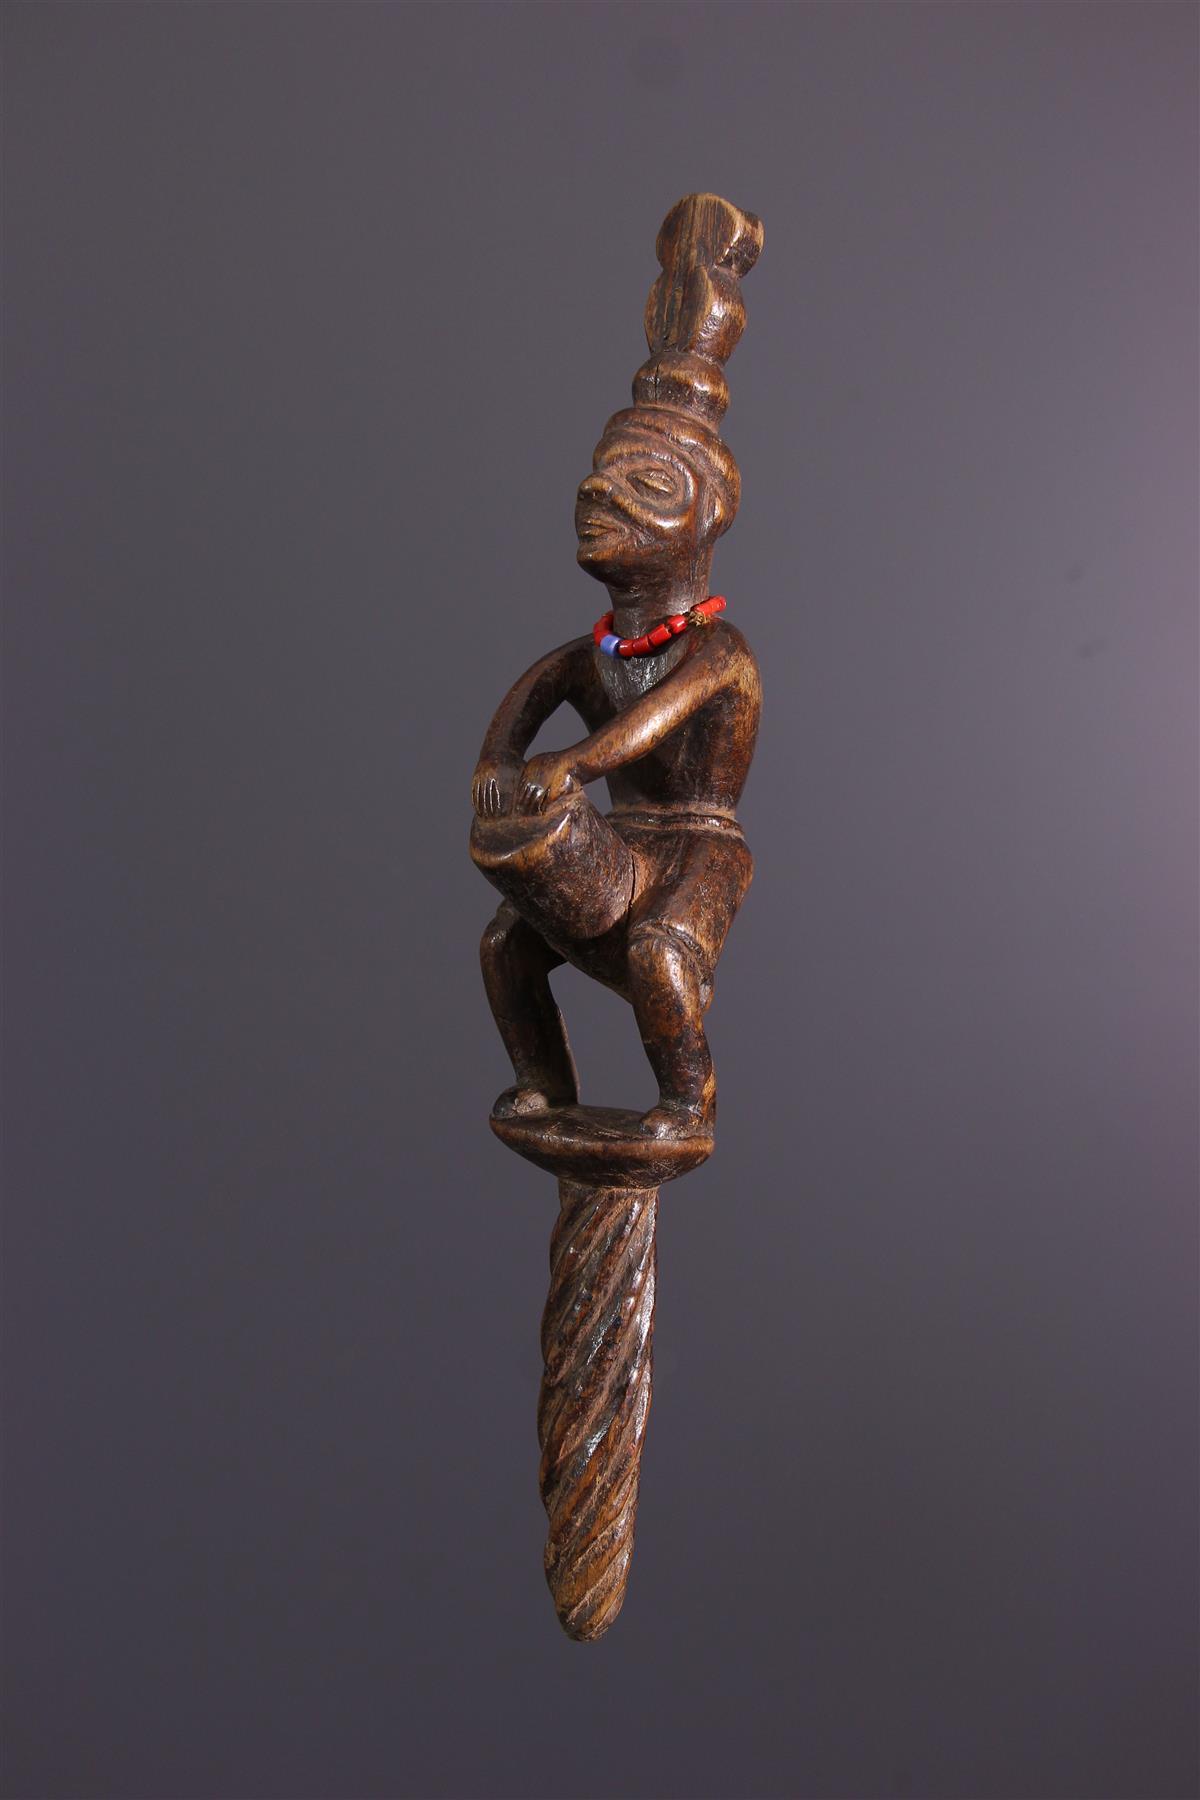 Sceptre Nkanu - African art